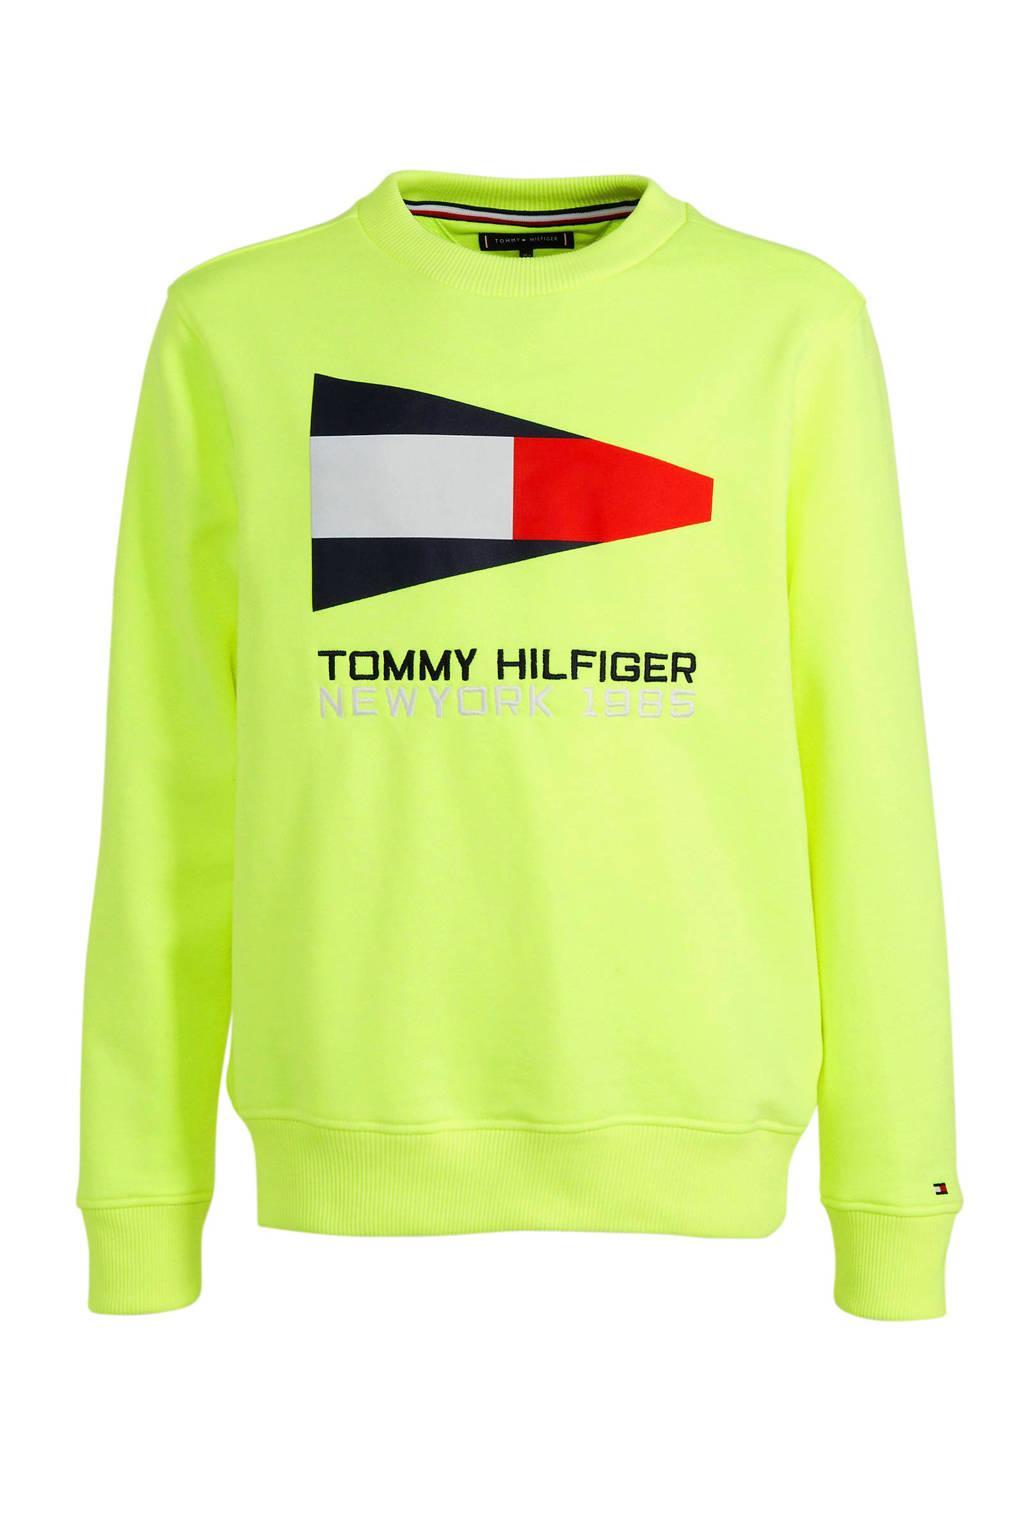 Tommy Hilfiger sweater met logo geel/donkerblauw/rood, Geel/donkerblauw/rood